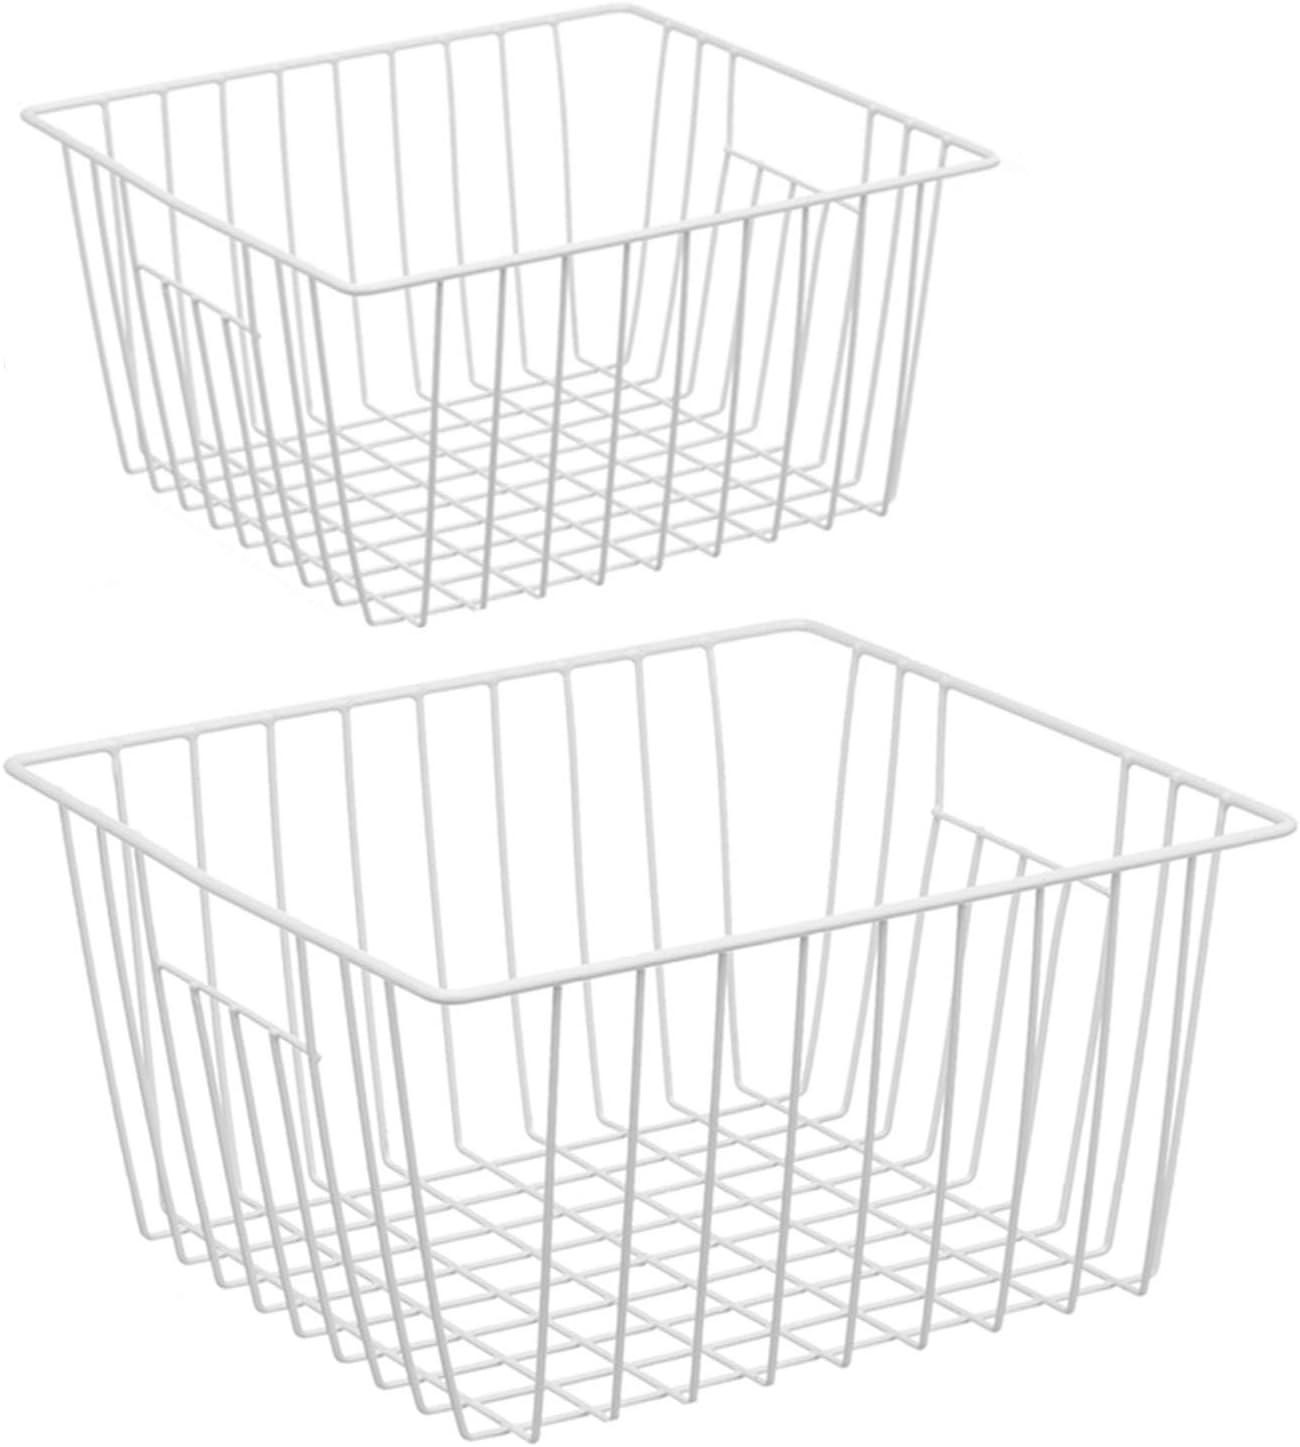 iPEGTOP Freezer Storage Organizer Basket, Wire Food Organizers Basket, Household Bin Basket with Handles for Kitchen Cabinets, Pantry,Freezer, Bathroom, Closets, Set of 2